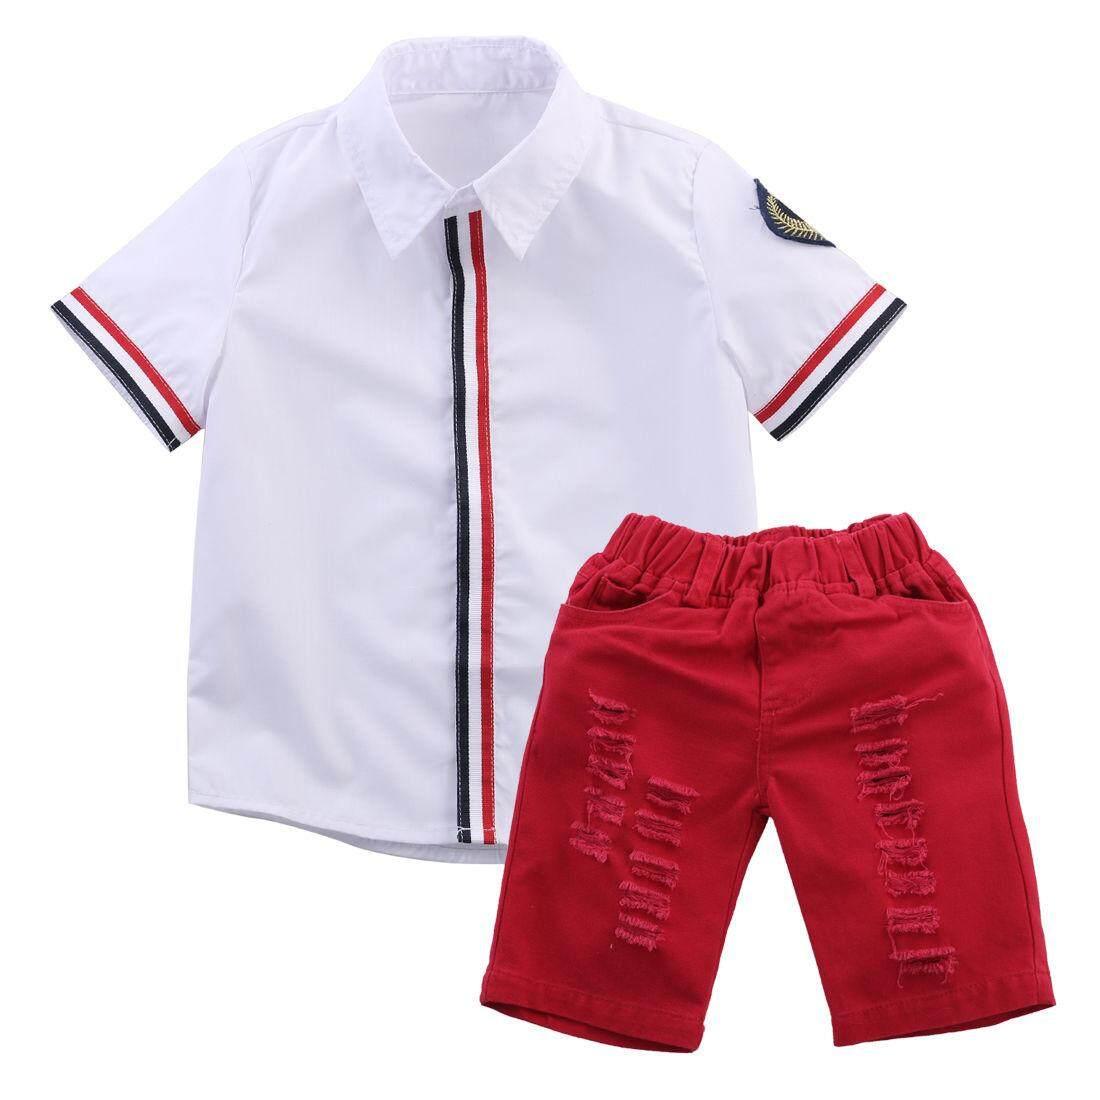 ... Wanita Keren / Set Modern ... Source · Cherry' house 2-7Y Kids White Shirt Tops+Red Ripped Shorts Children Boys